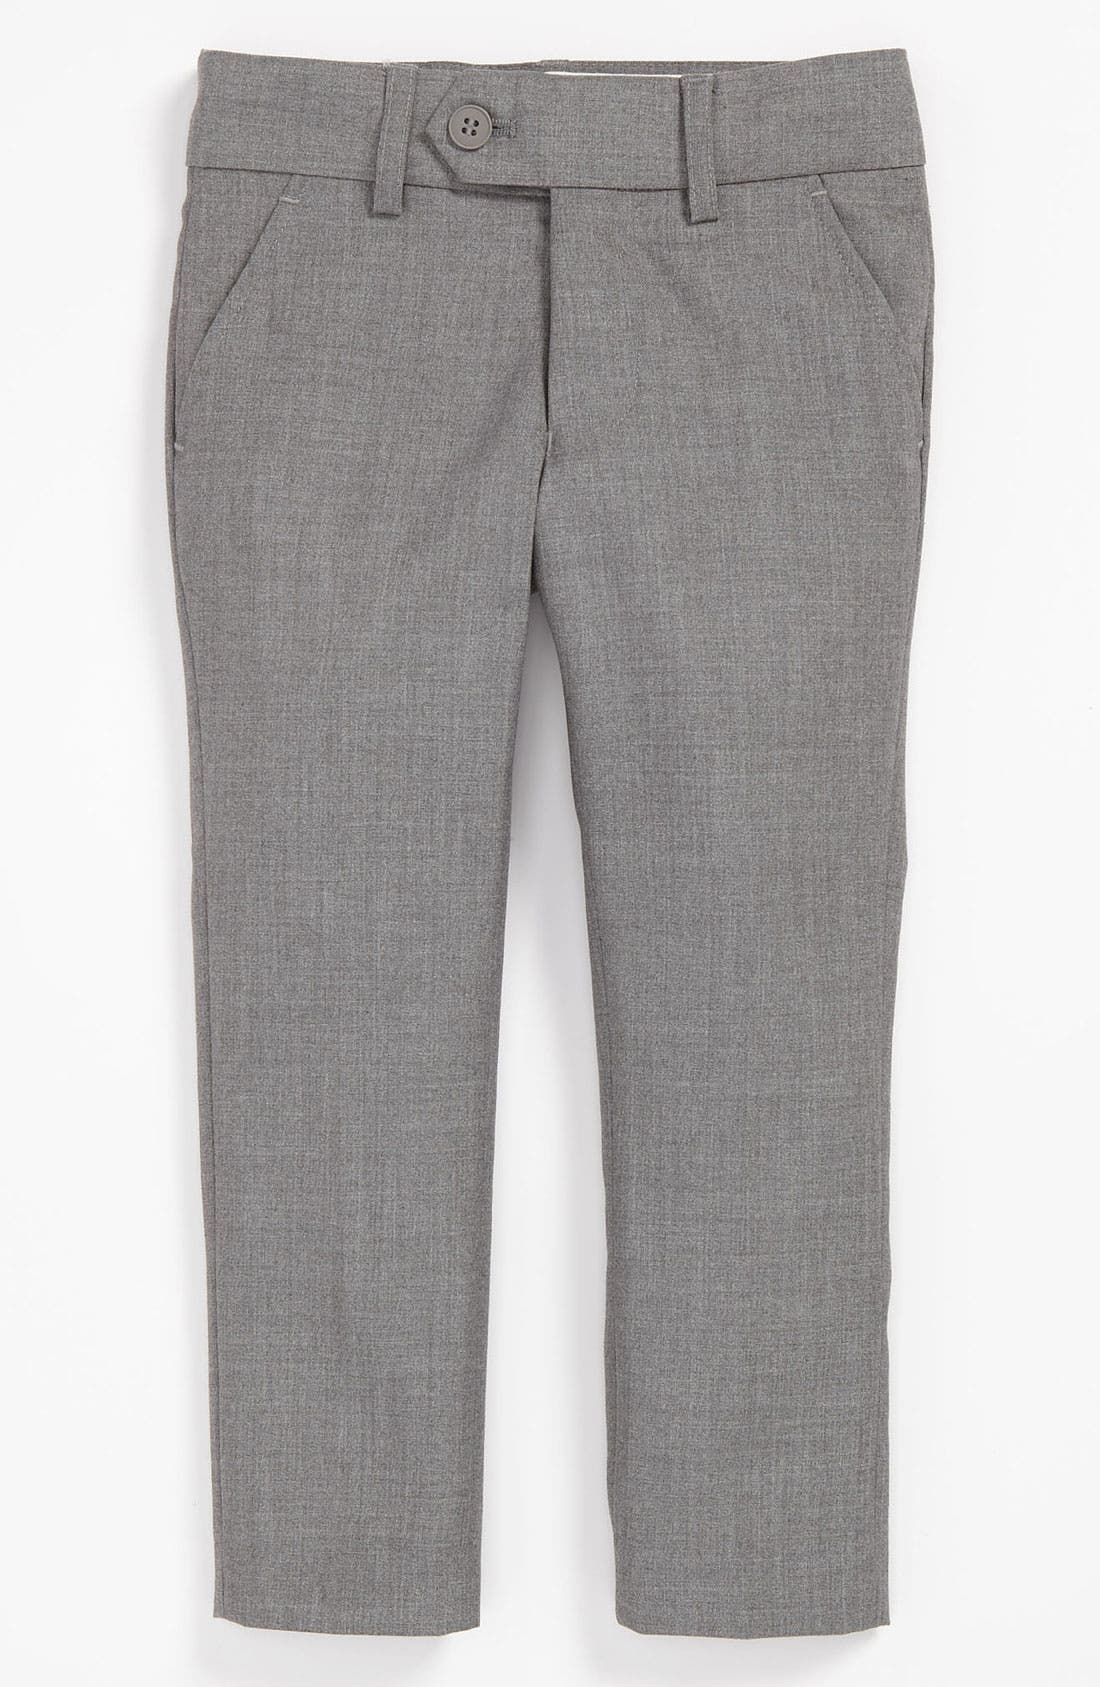 Alternate Image 1 Selected - Appaman Suit Pants (Toddler)